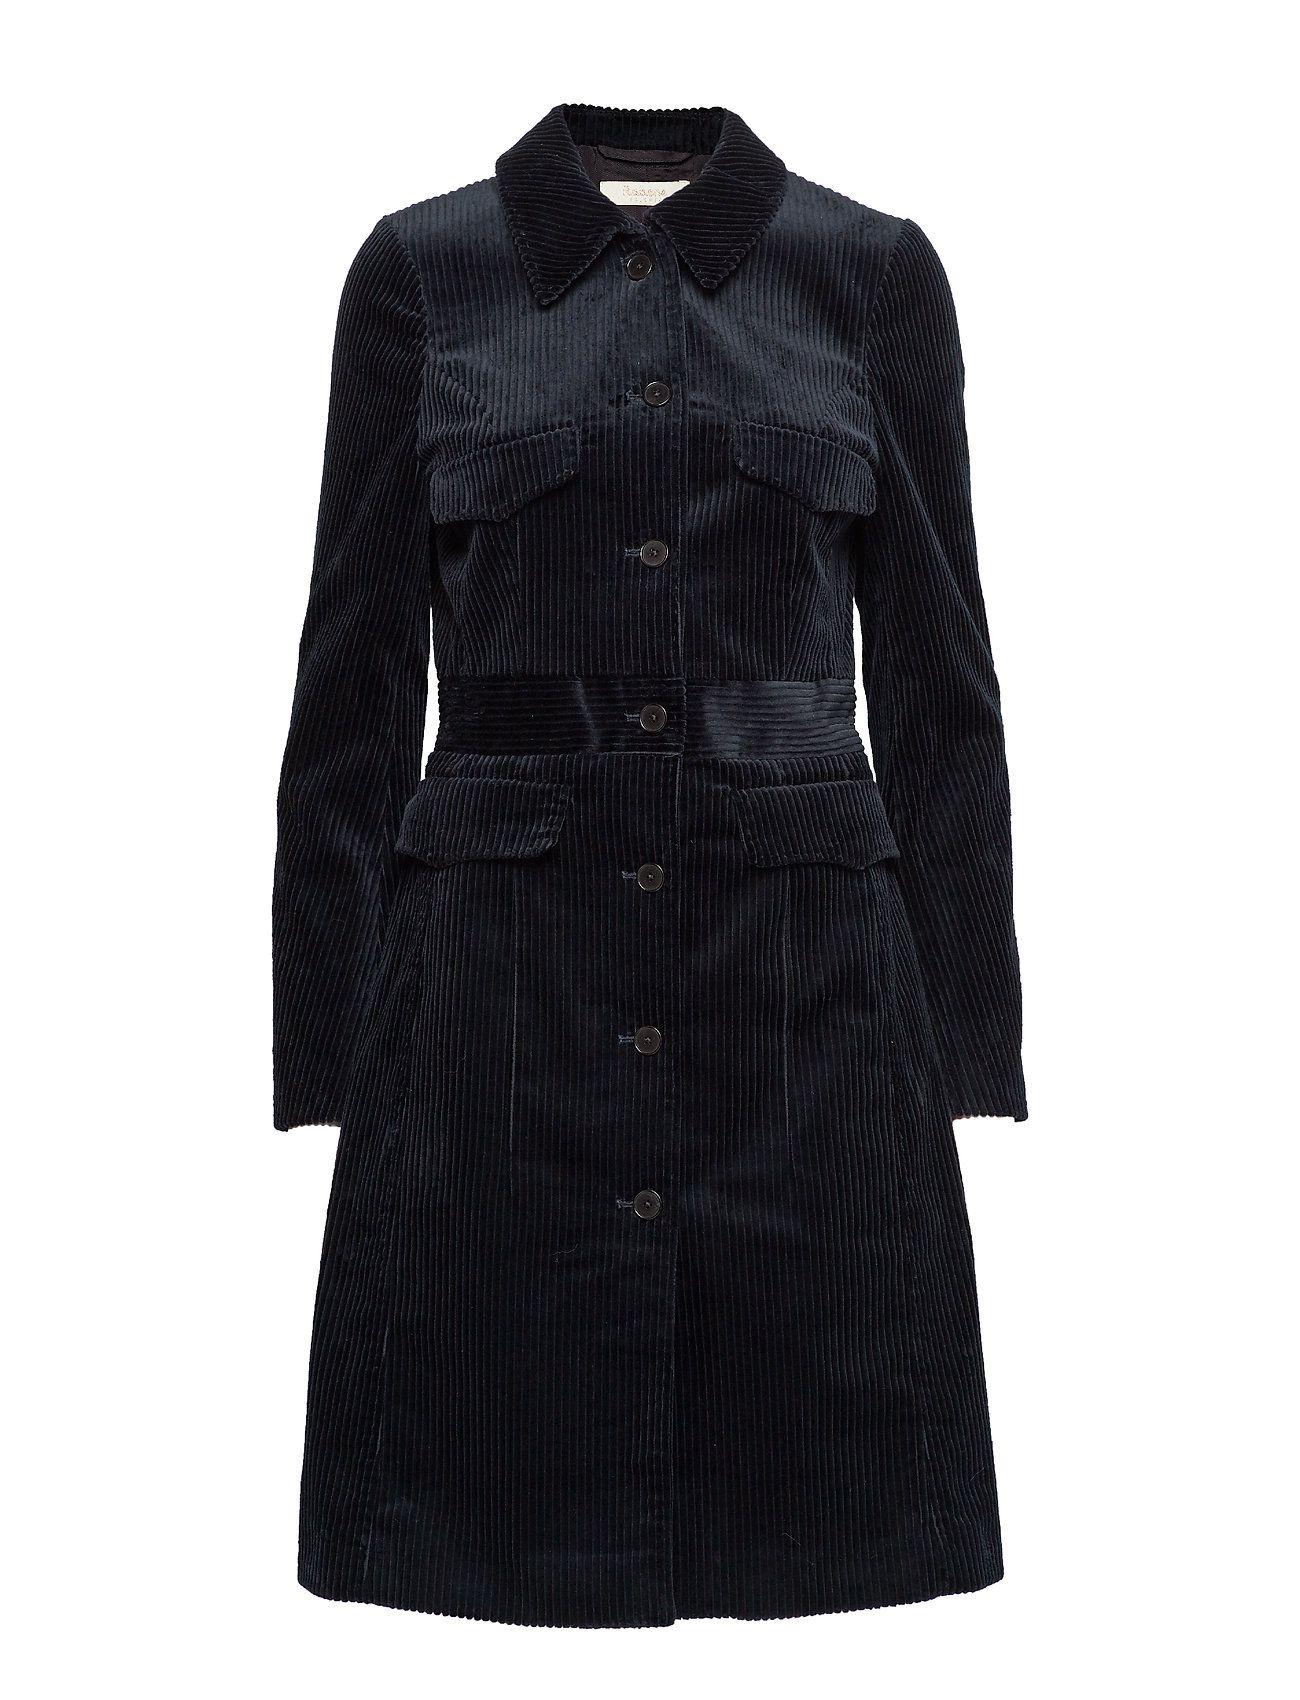 097627e5899 mbyM - Blazer - Lis Gilroy - Black i 2019 | Tøj | Blazer, Jackets og Suit  Jacket